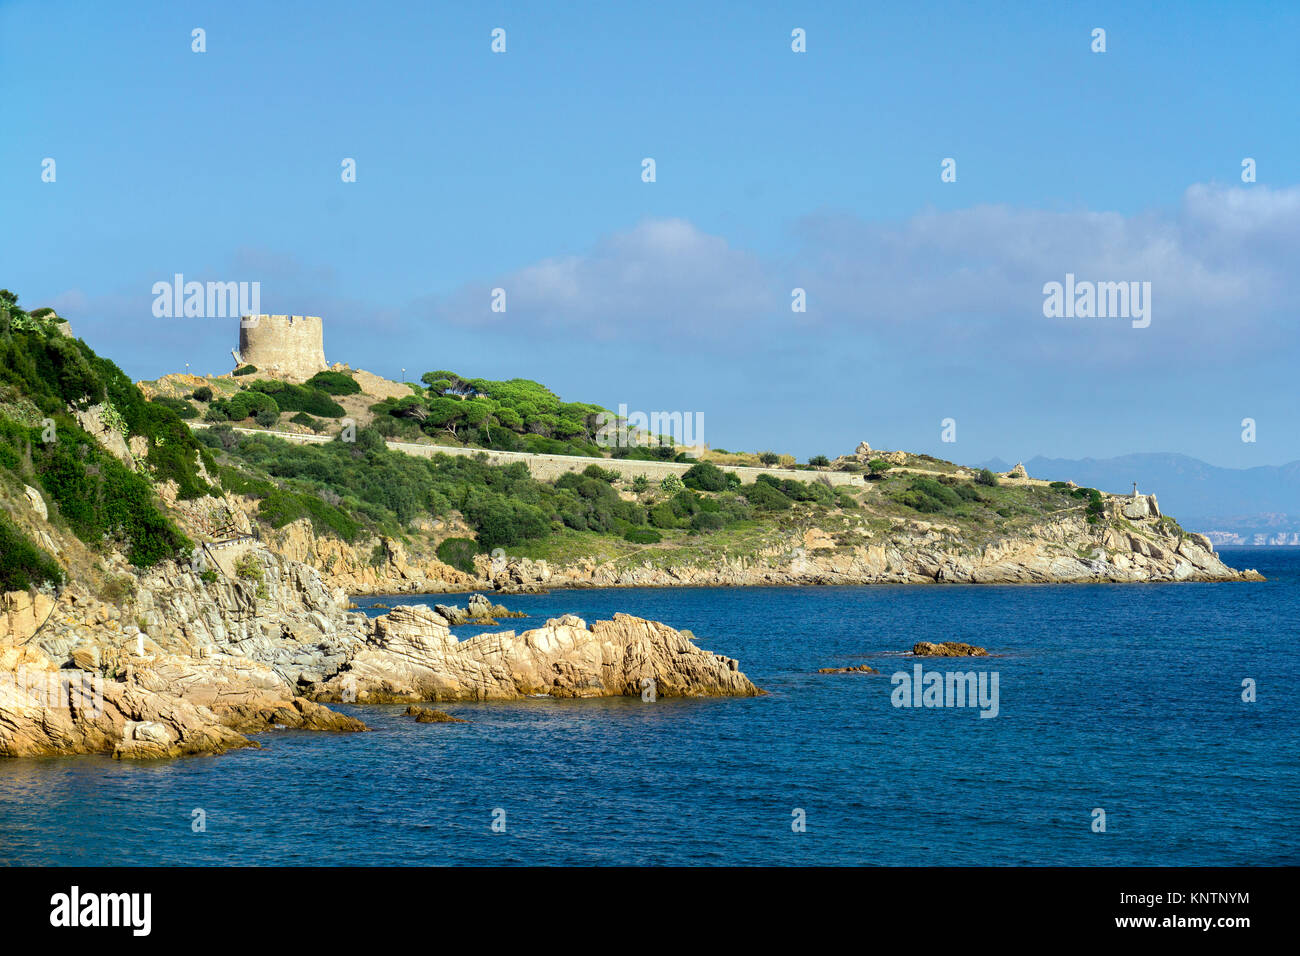 Torre di Torre Langosardo Longonsardo, en la costa de Santa Teresa di Gallura, Cerdeña, Italia, el mar Mediterráneo, Imagen De Stock